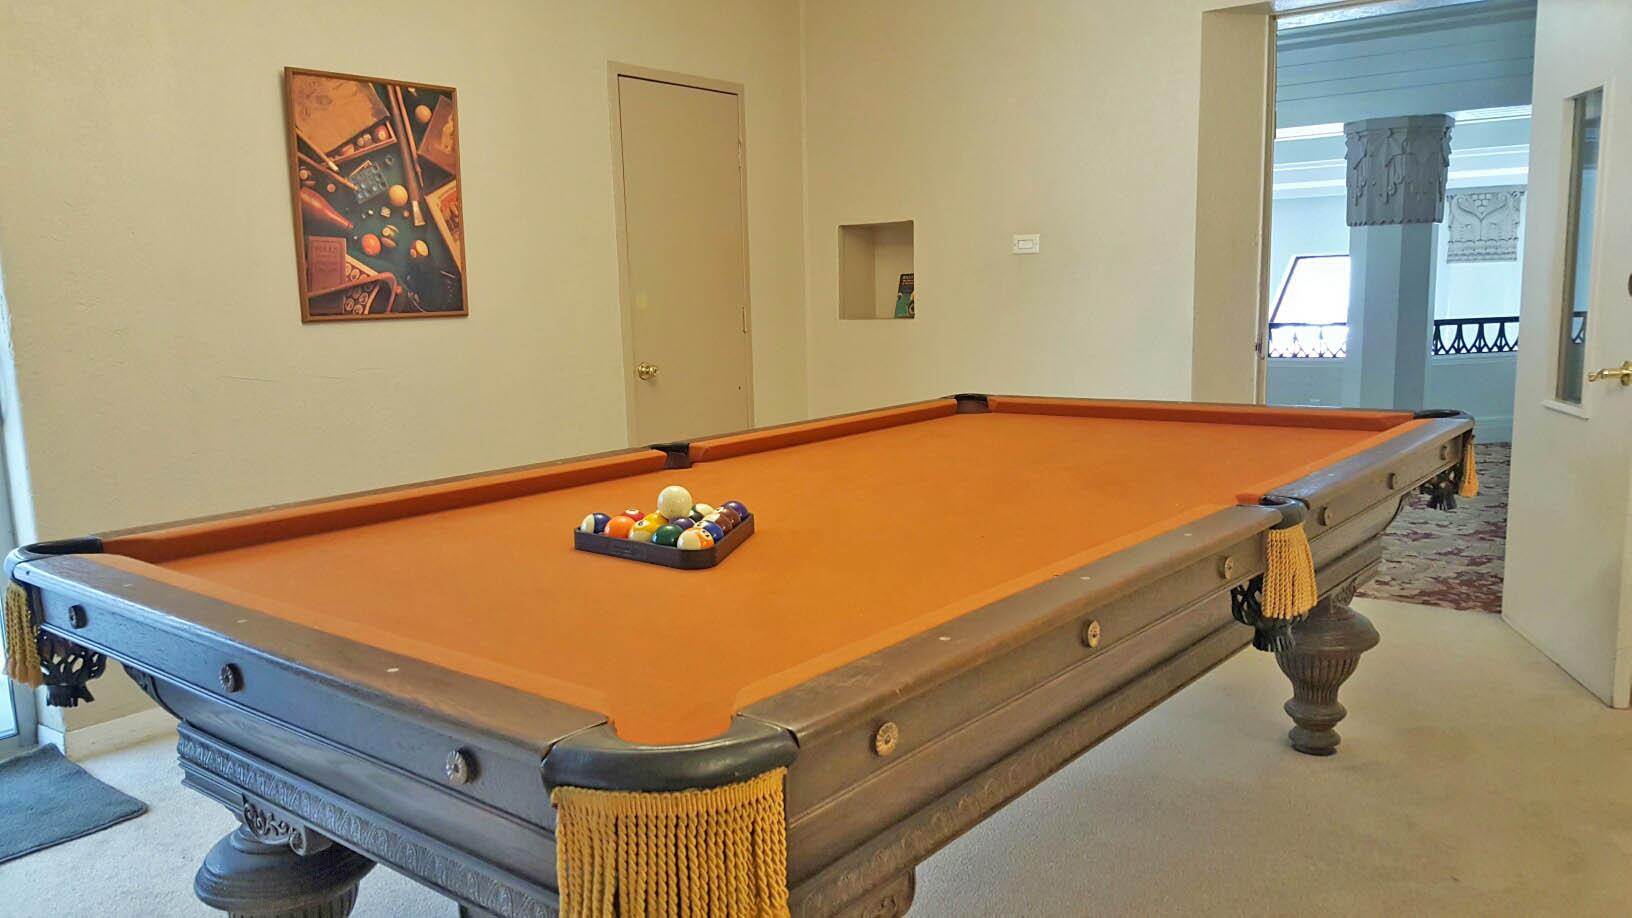 140 linden pool table.jpg